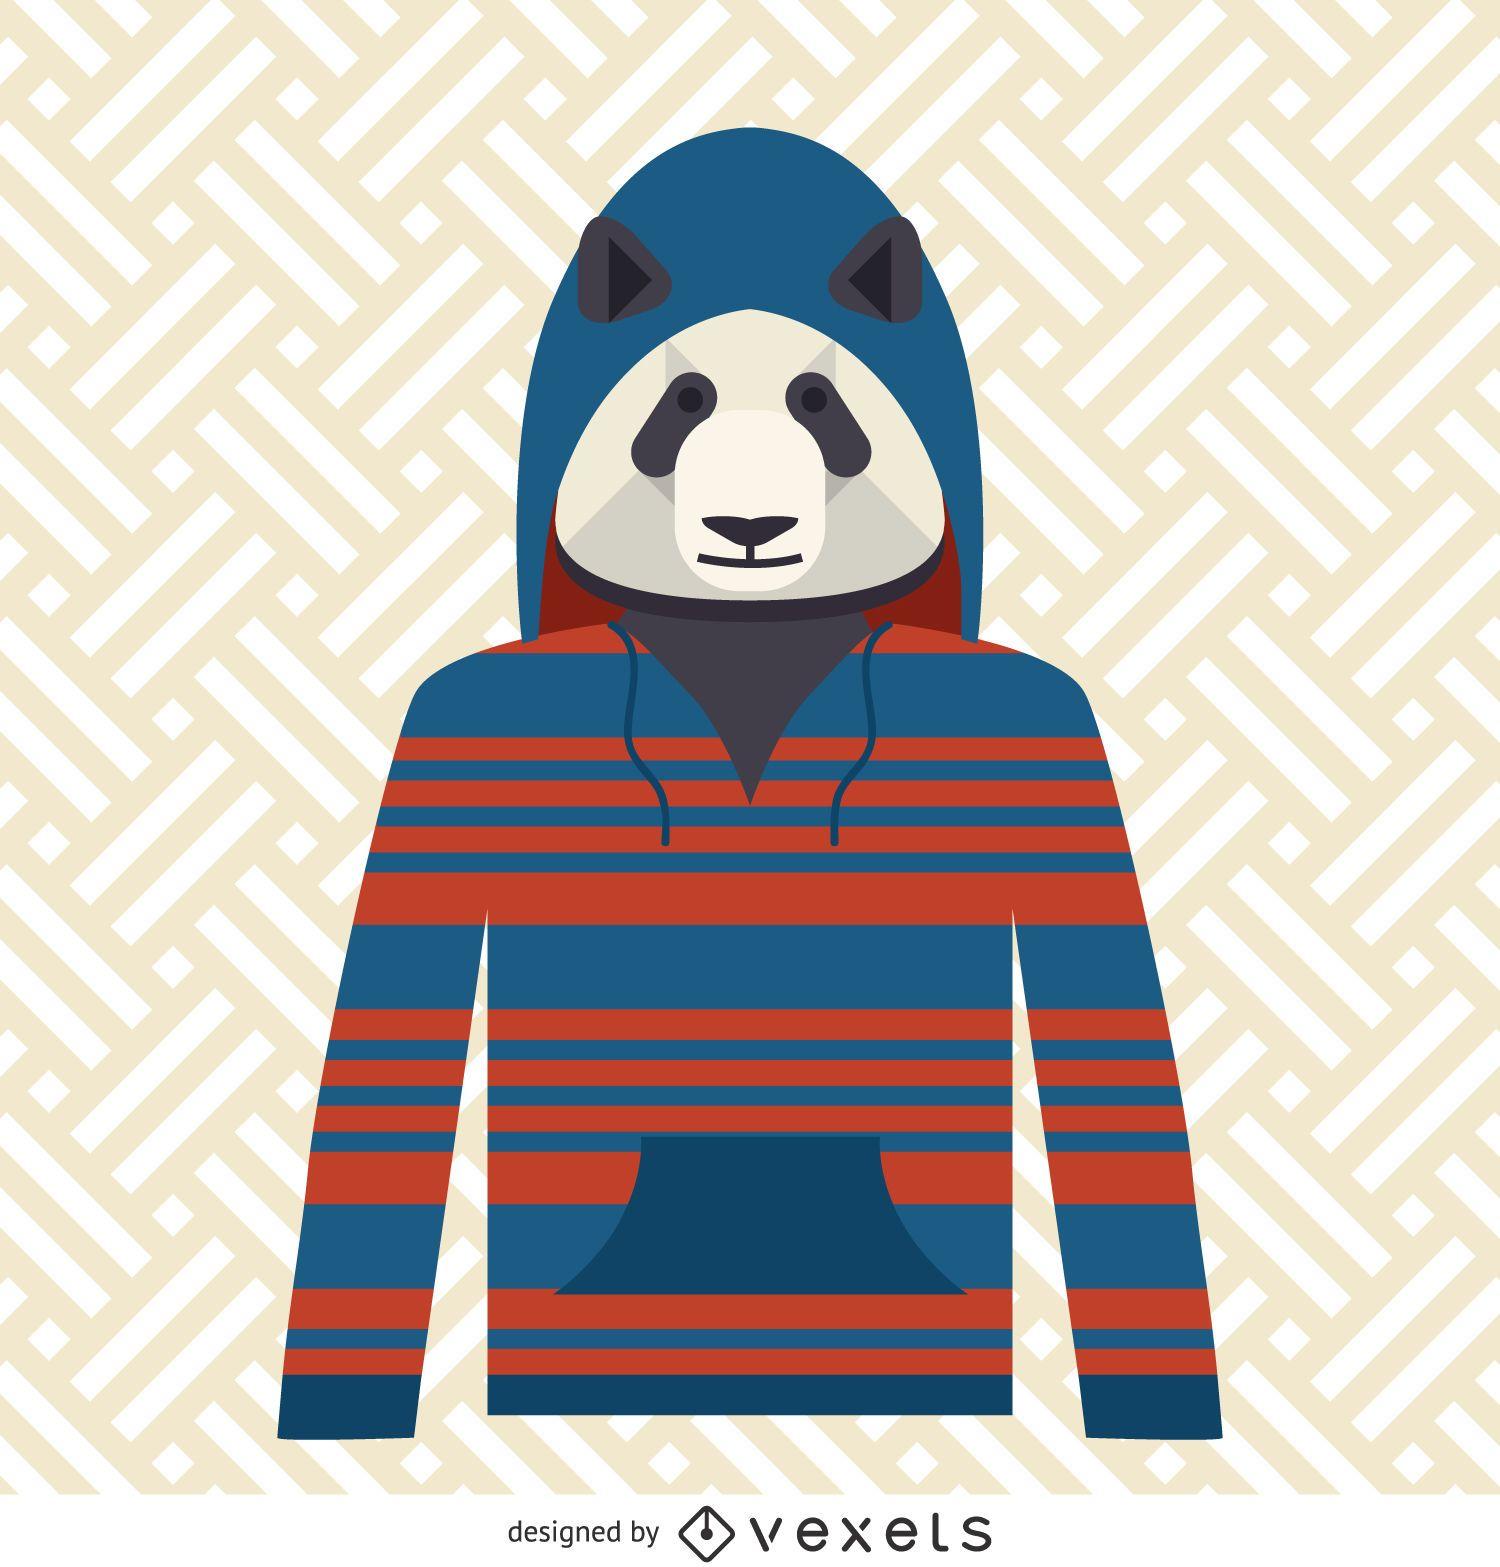 Panda with hoodie illustration